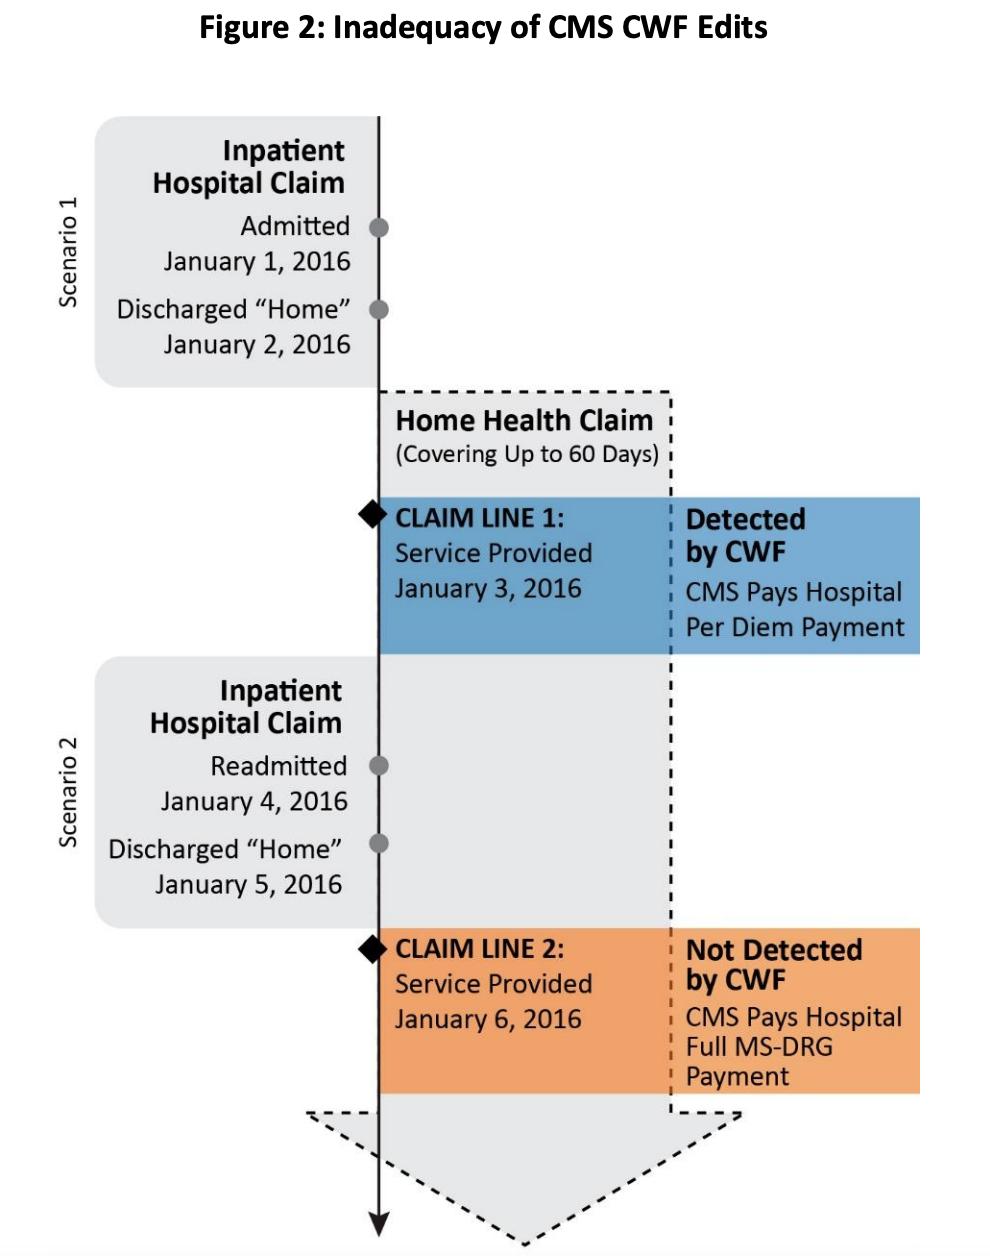 Hospital transfer drg revenue challenges | revenue intelligence with cloudmed solutions | cloudmed | 7lya50tlqkl53mng6vk12fvgvz2 tf6b0h9jk1w93rukc2uugn4nkbtodke02sfij8zjmq